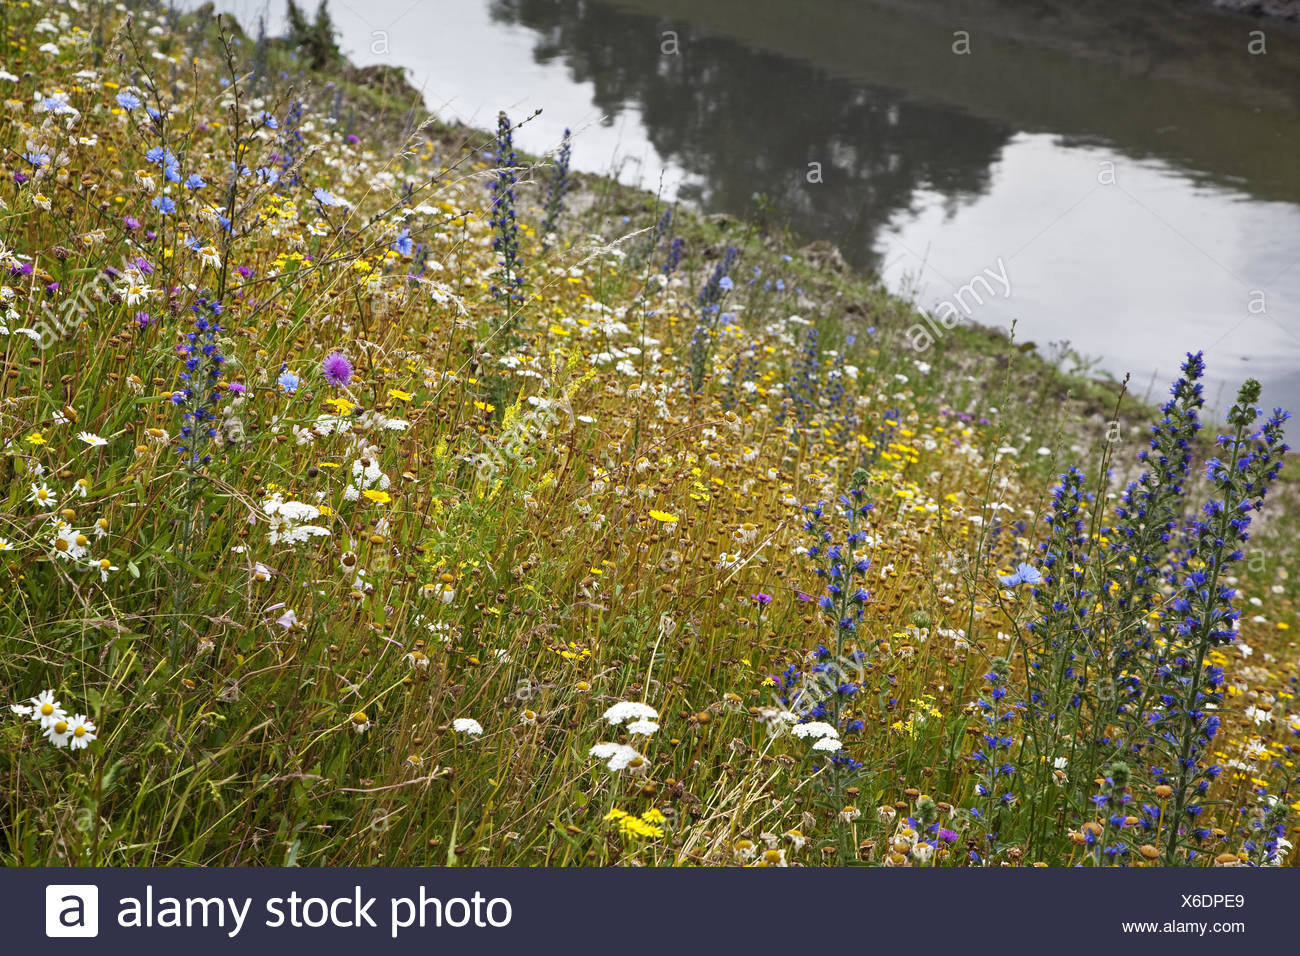 Wild flowers at the Emscher, Essen, Germany - Stock Image